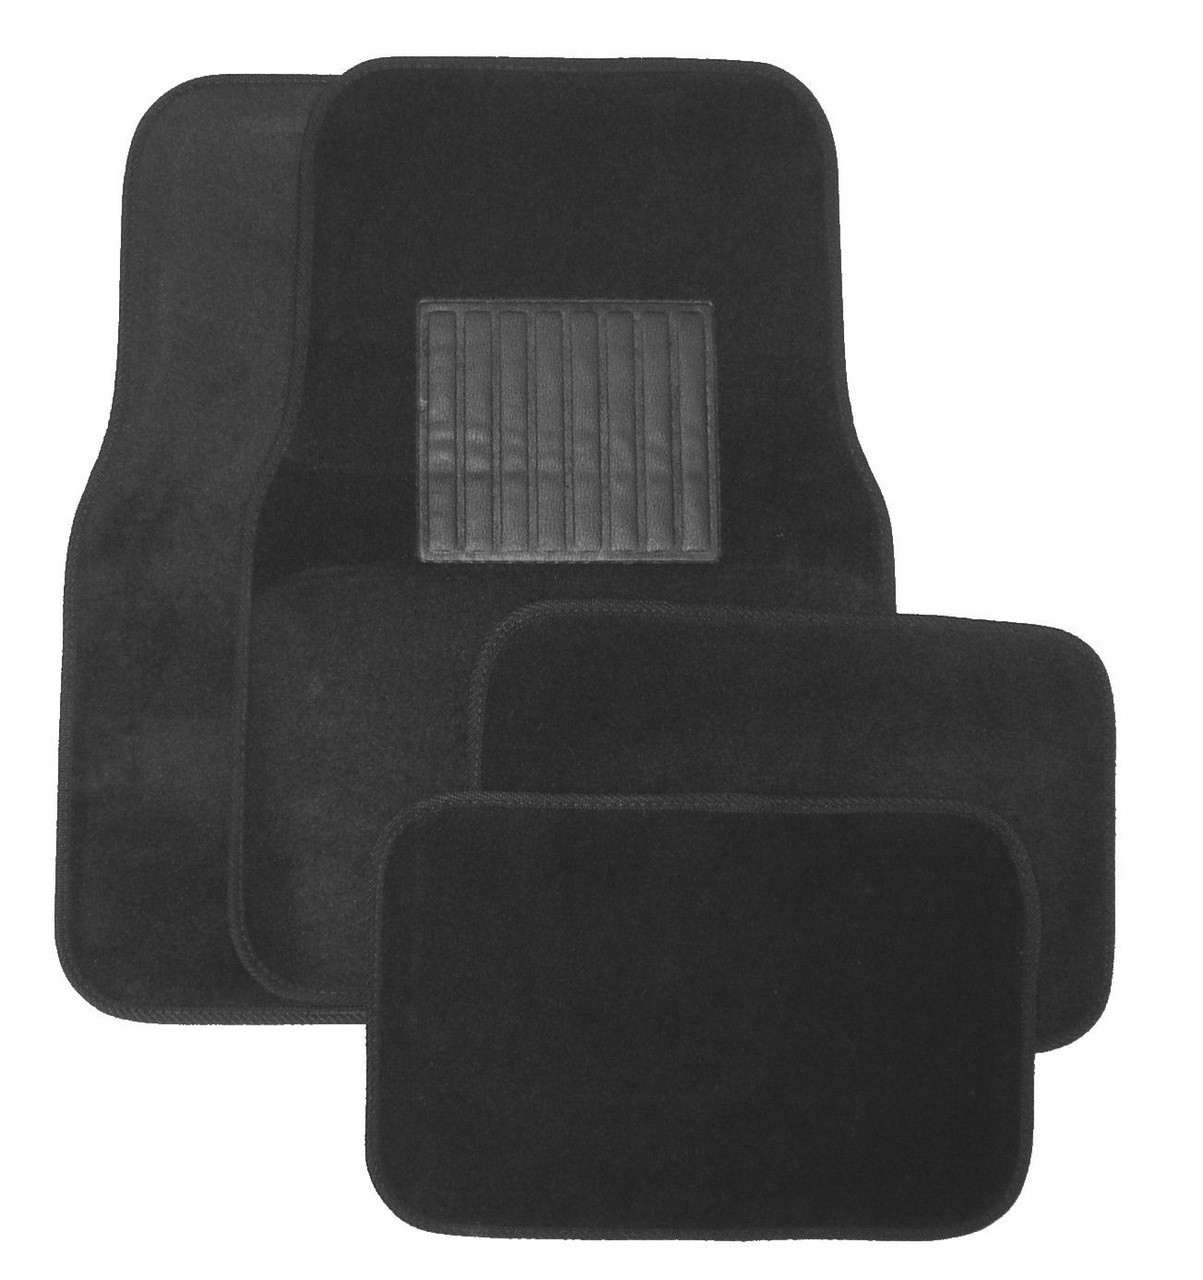 Hi-Tech 9203 Charcoal 4 piece Floor Mats